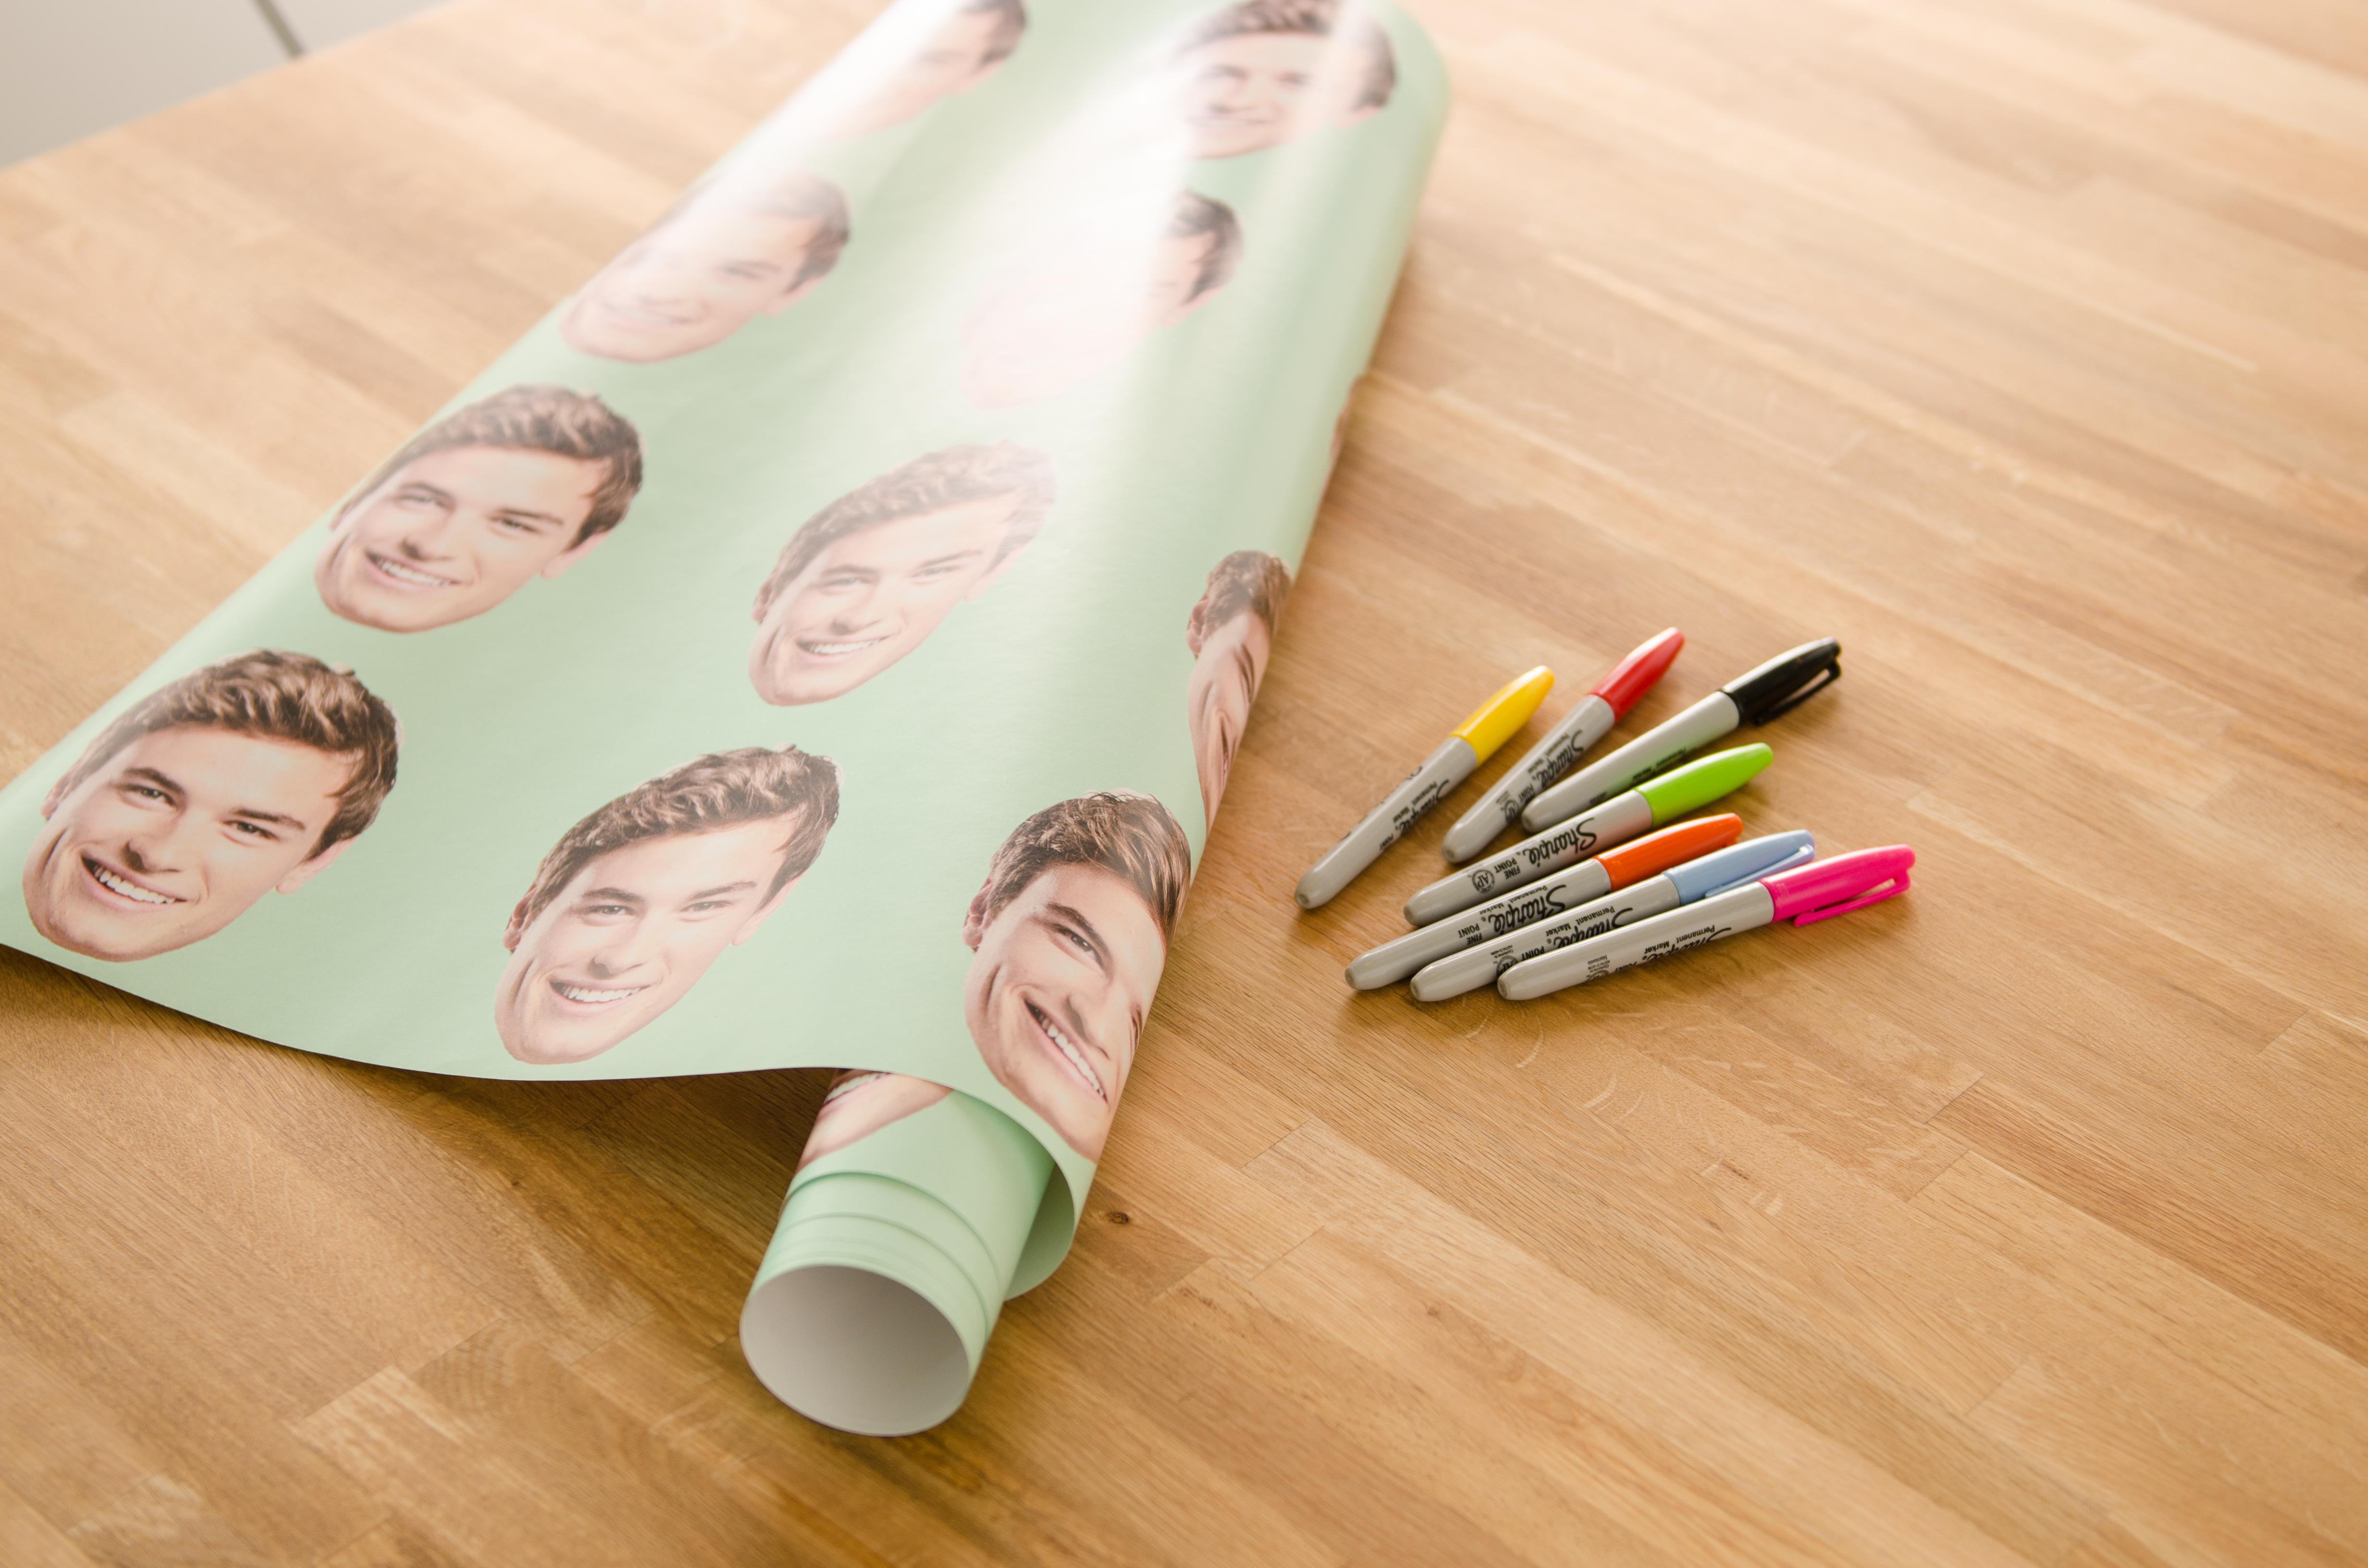 noteshelf make custom paper products